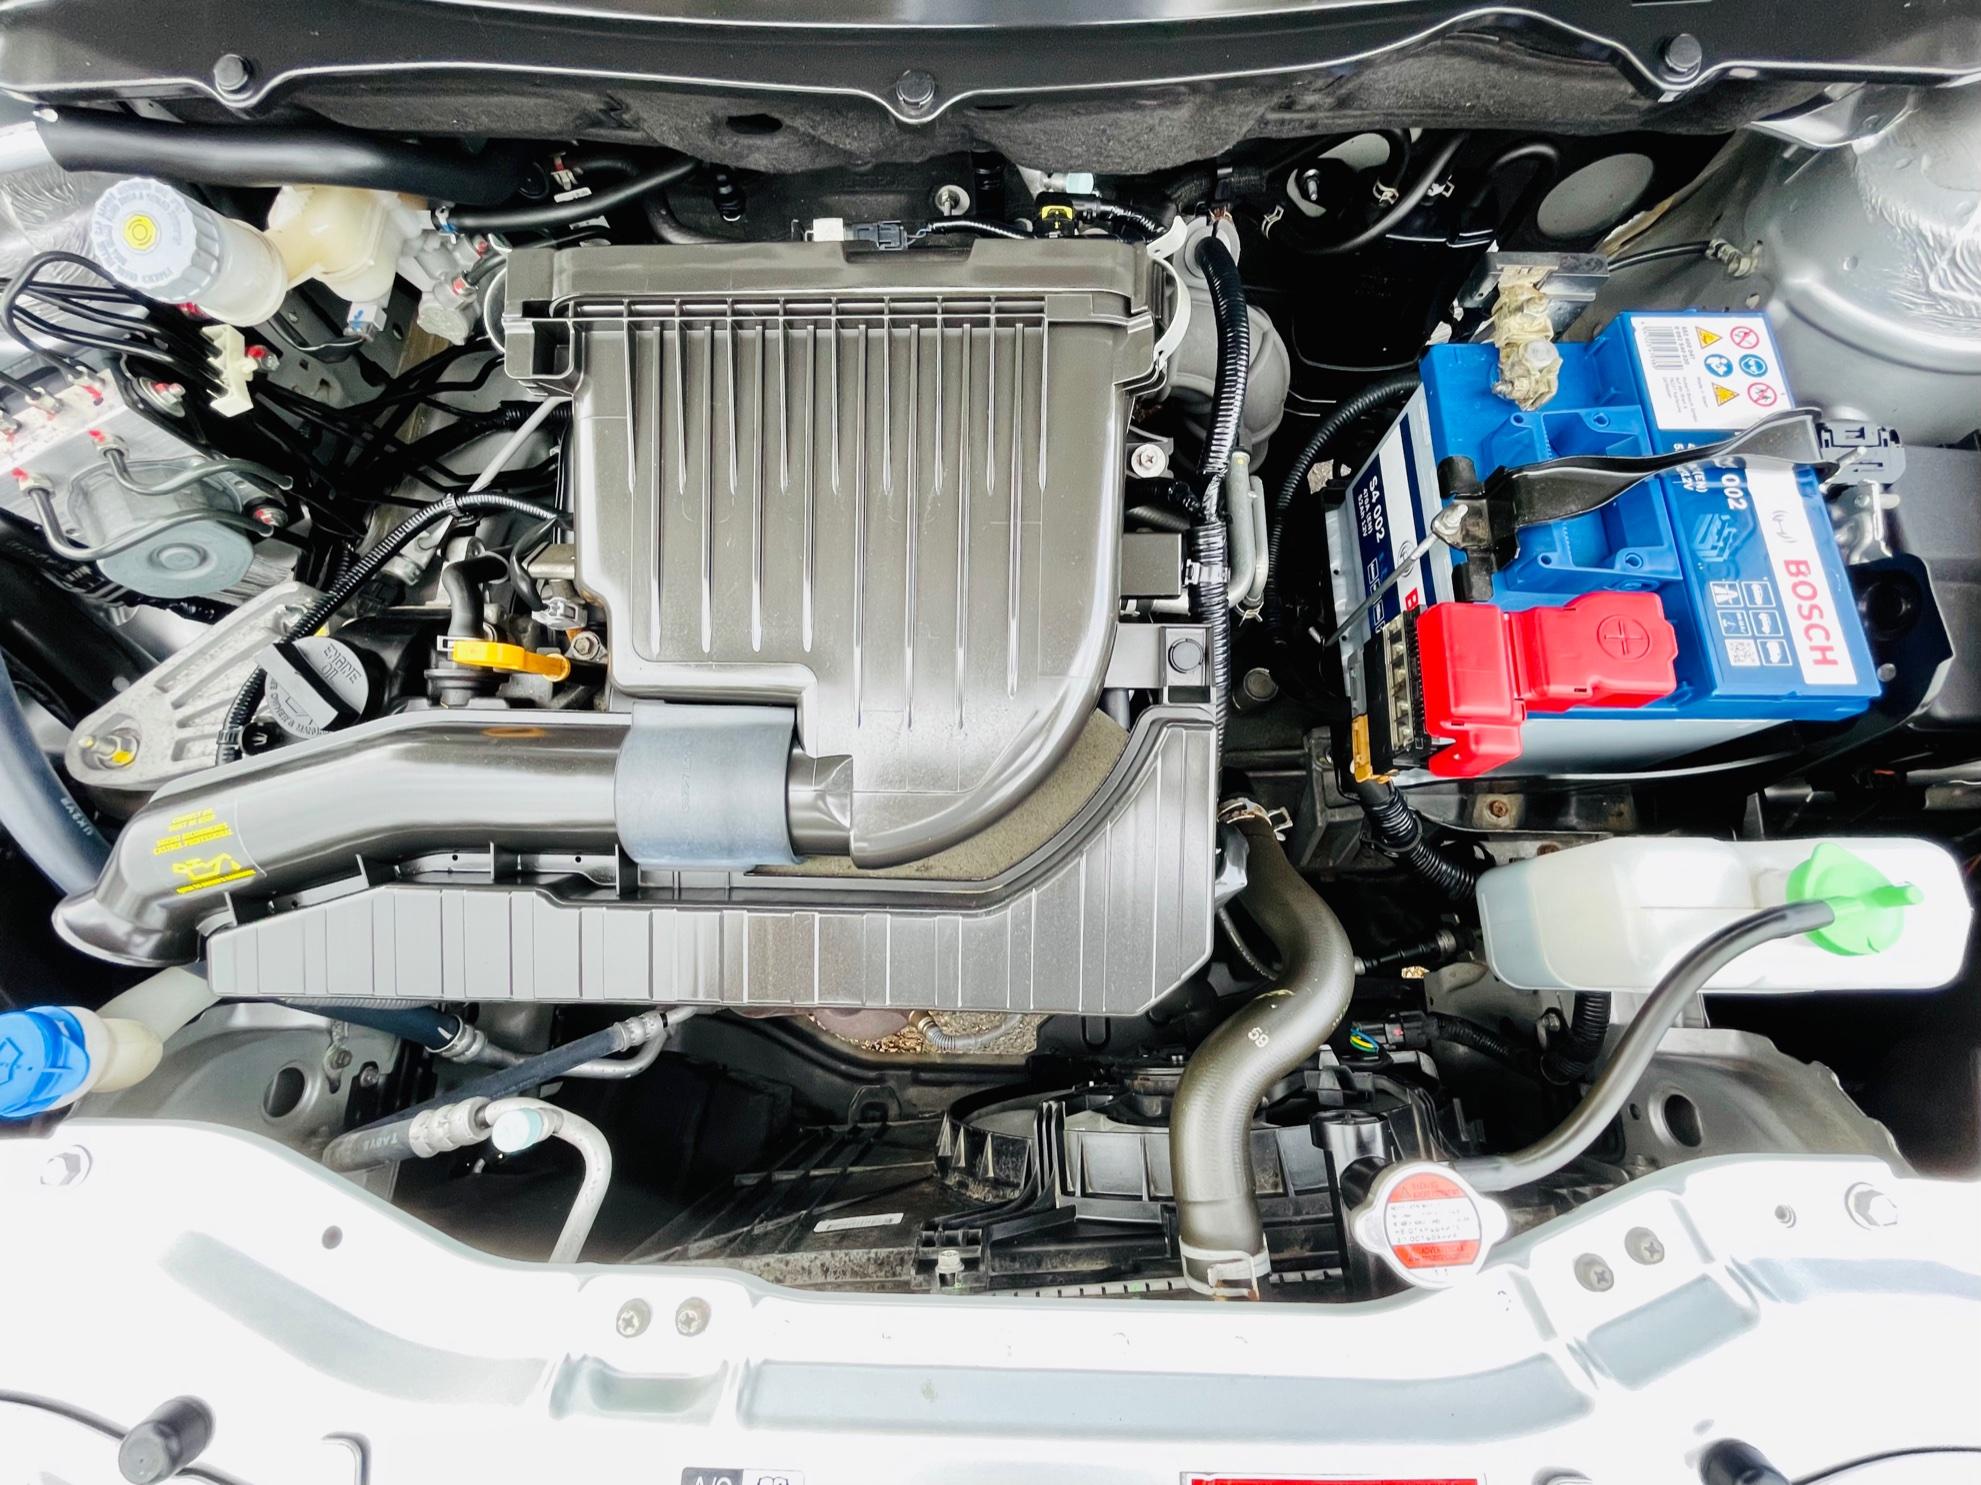 Car For Sale Suzuki Swift - KS65SRV Sixers Group Image #10